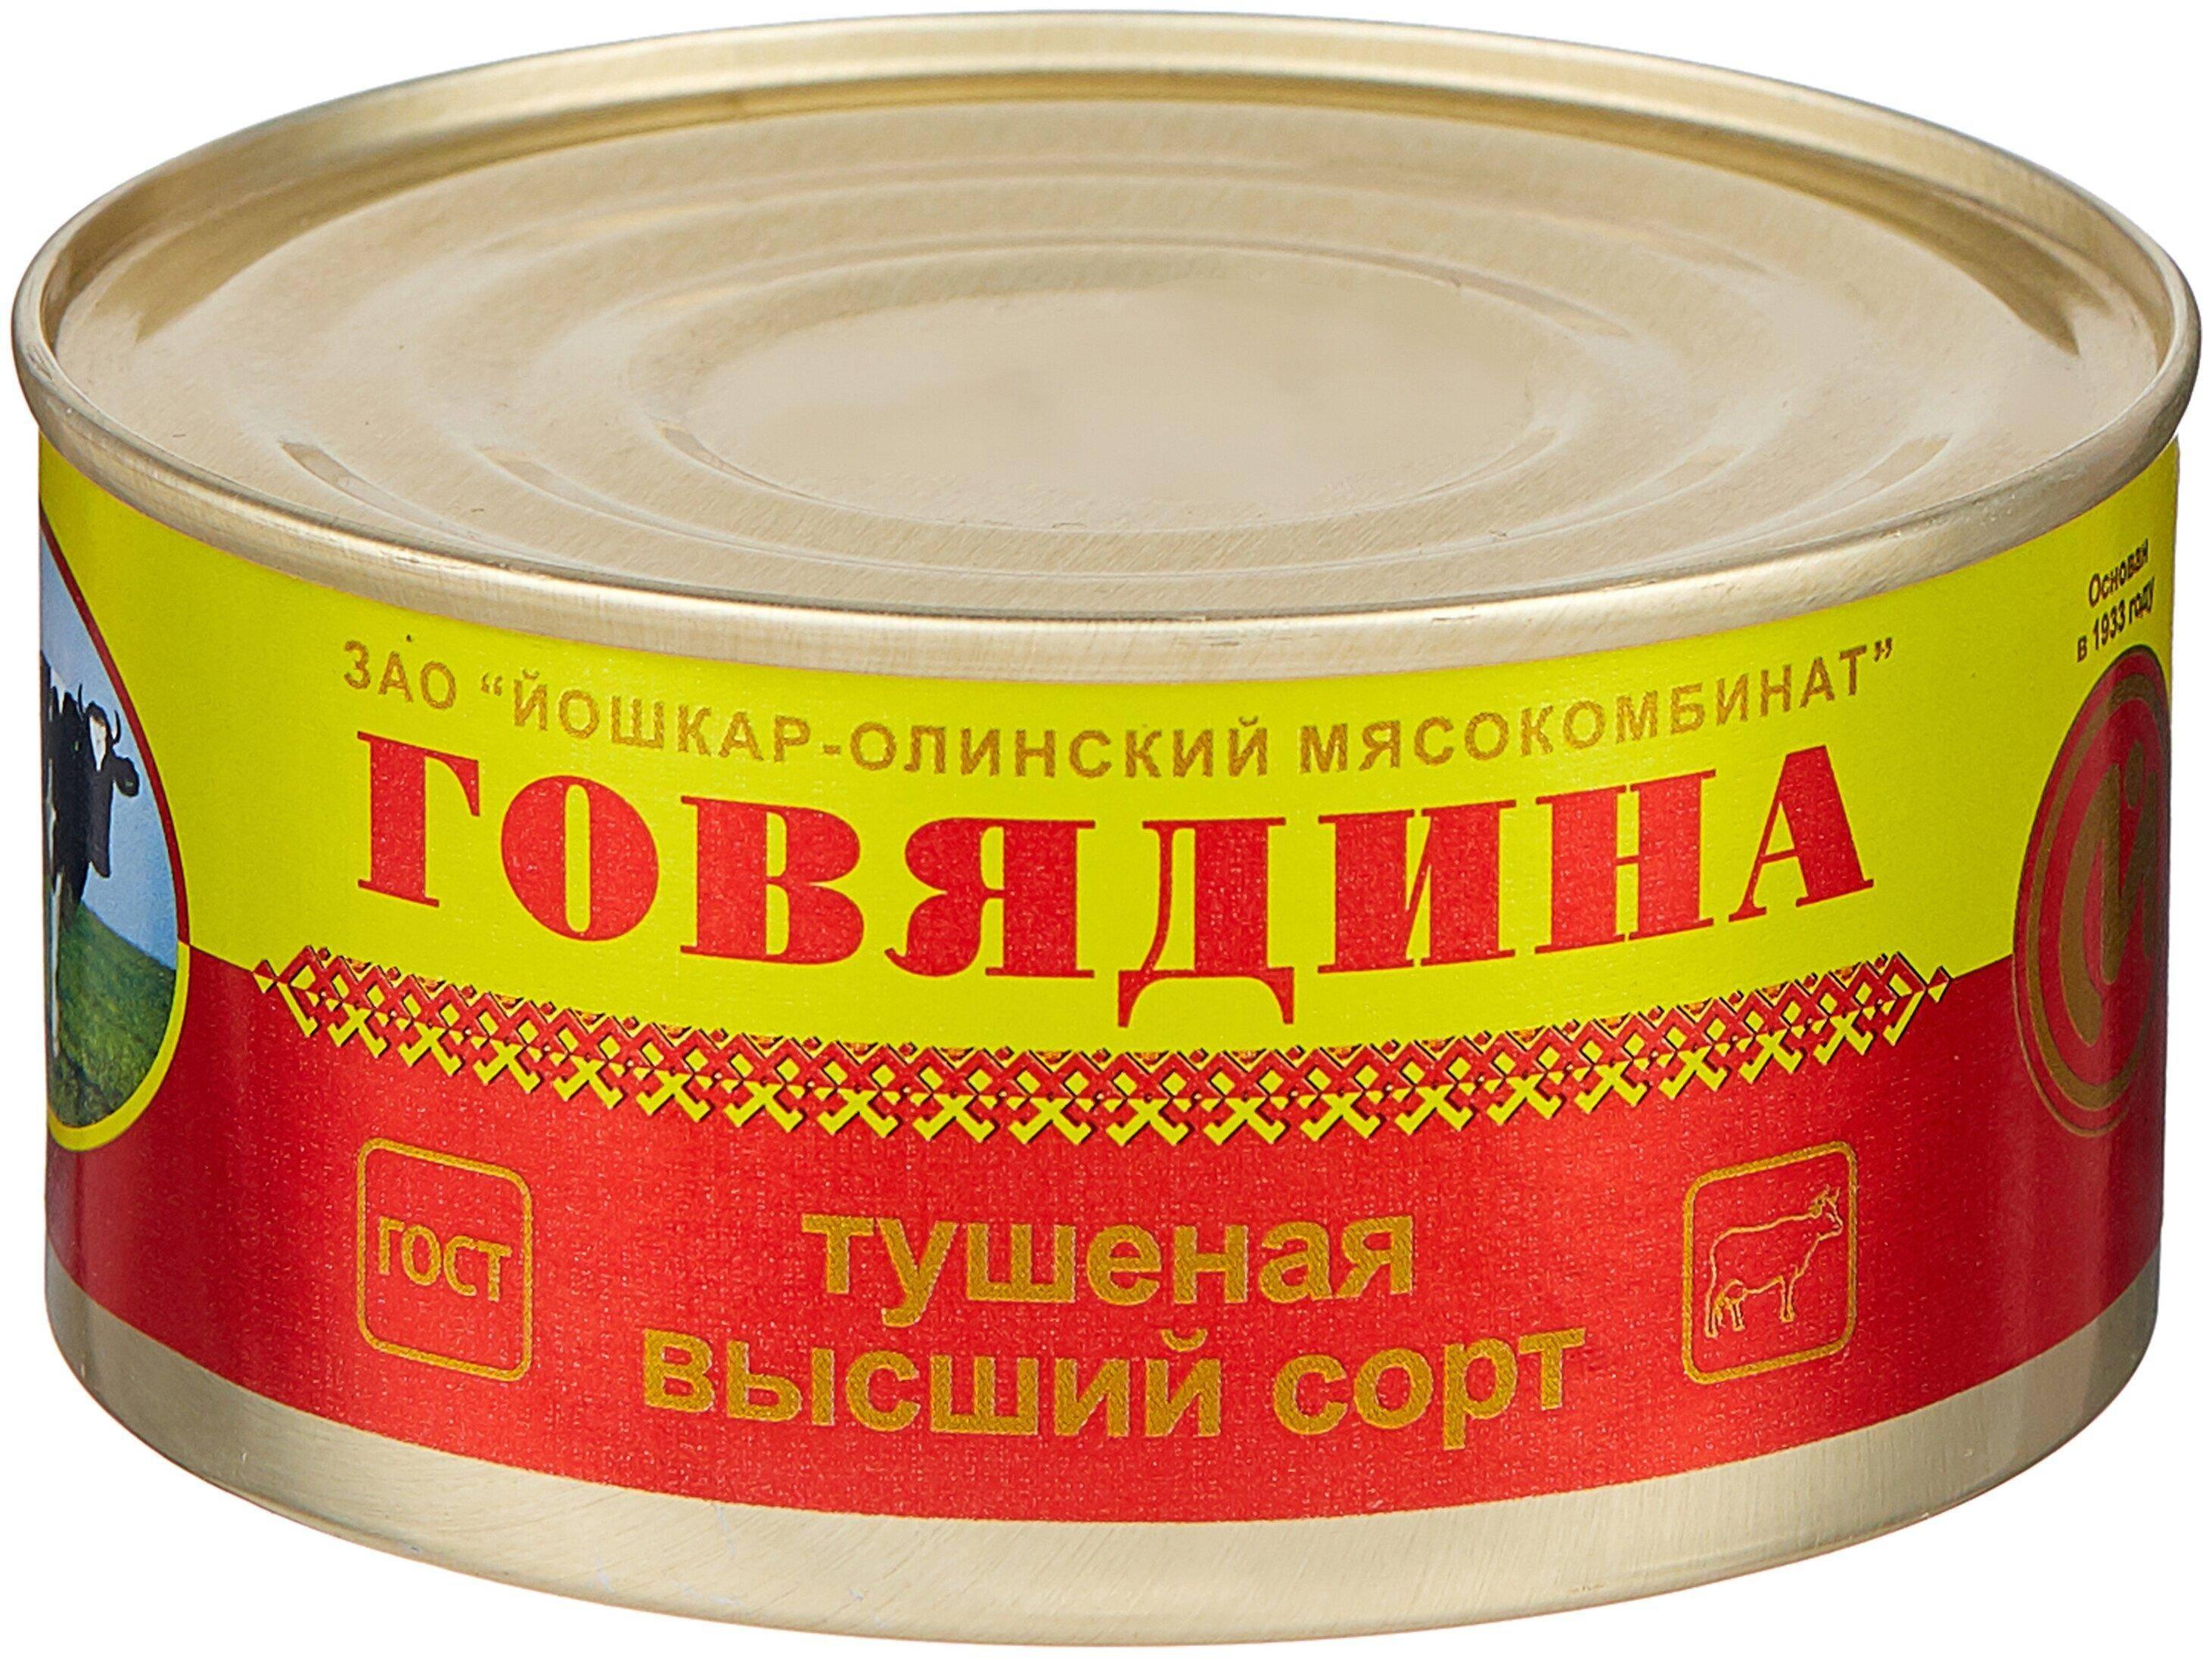 Йошкар-Олинский мясокомбинат Говядина ГОСТ